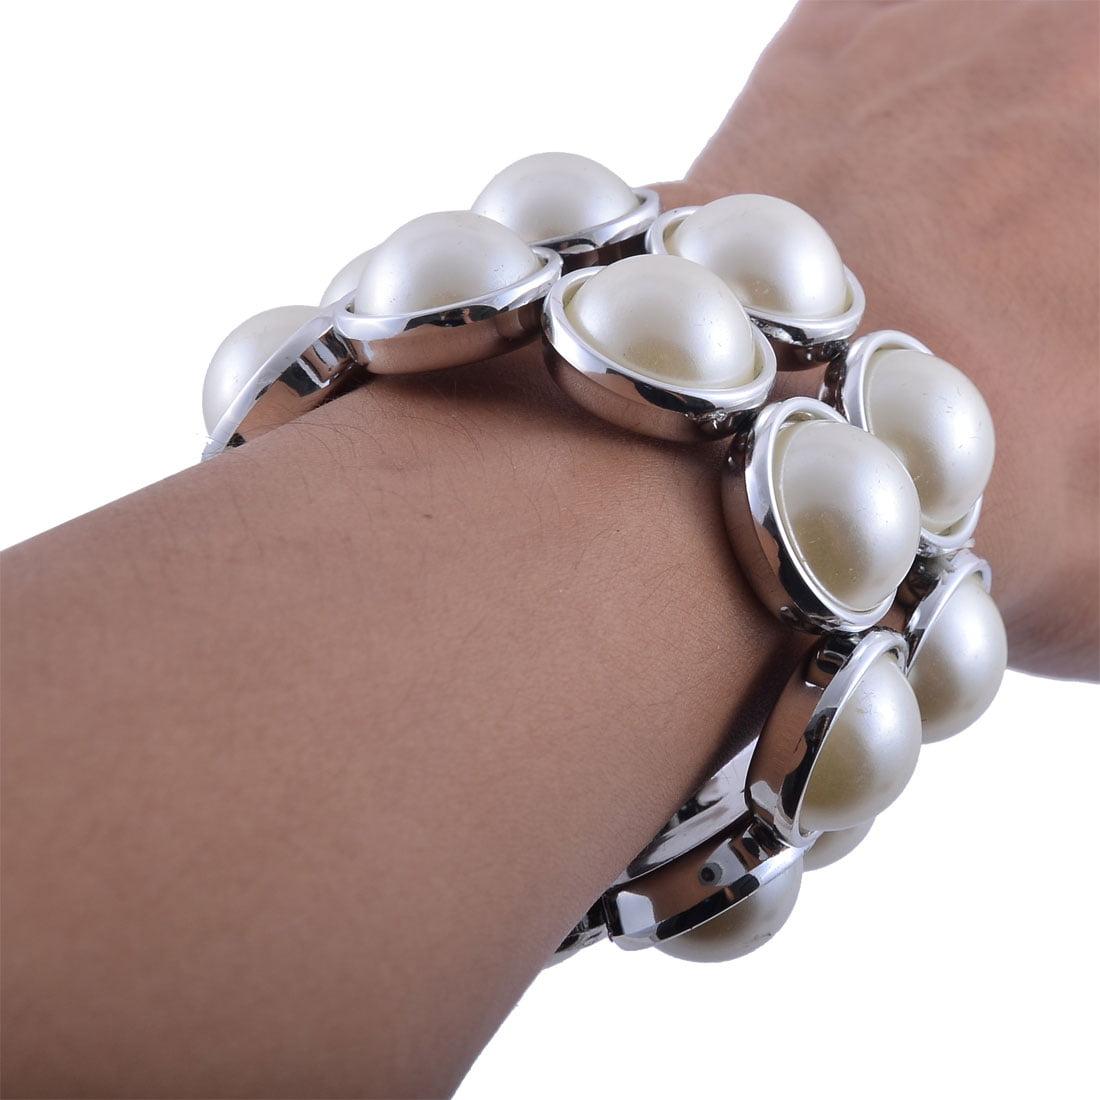 Lady Plastic Imitation Pearl Inlaid 2 Rows Elastic Cord Bracelet Silver Tone - image 1 de 2